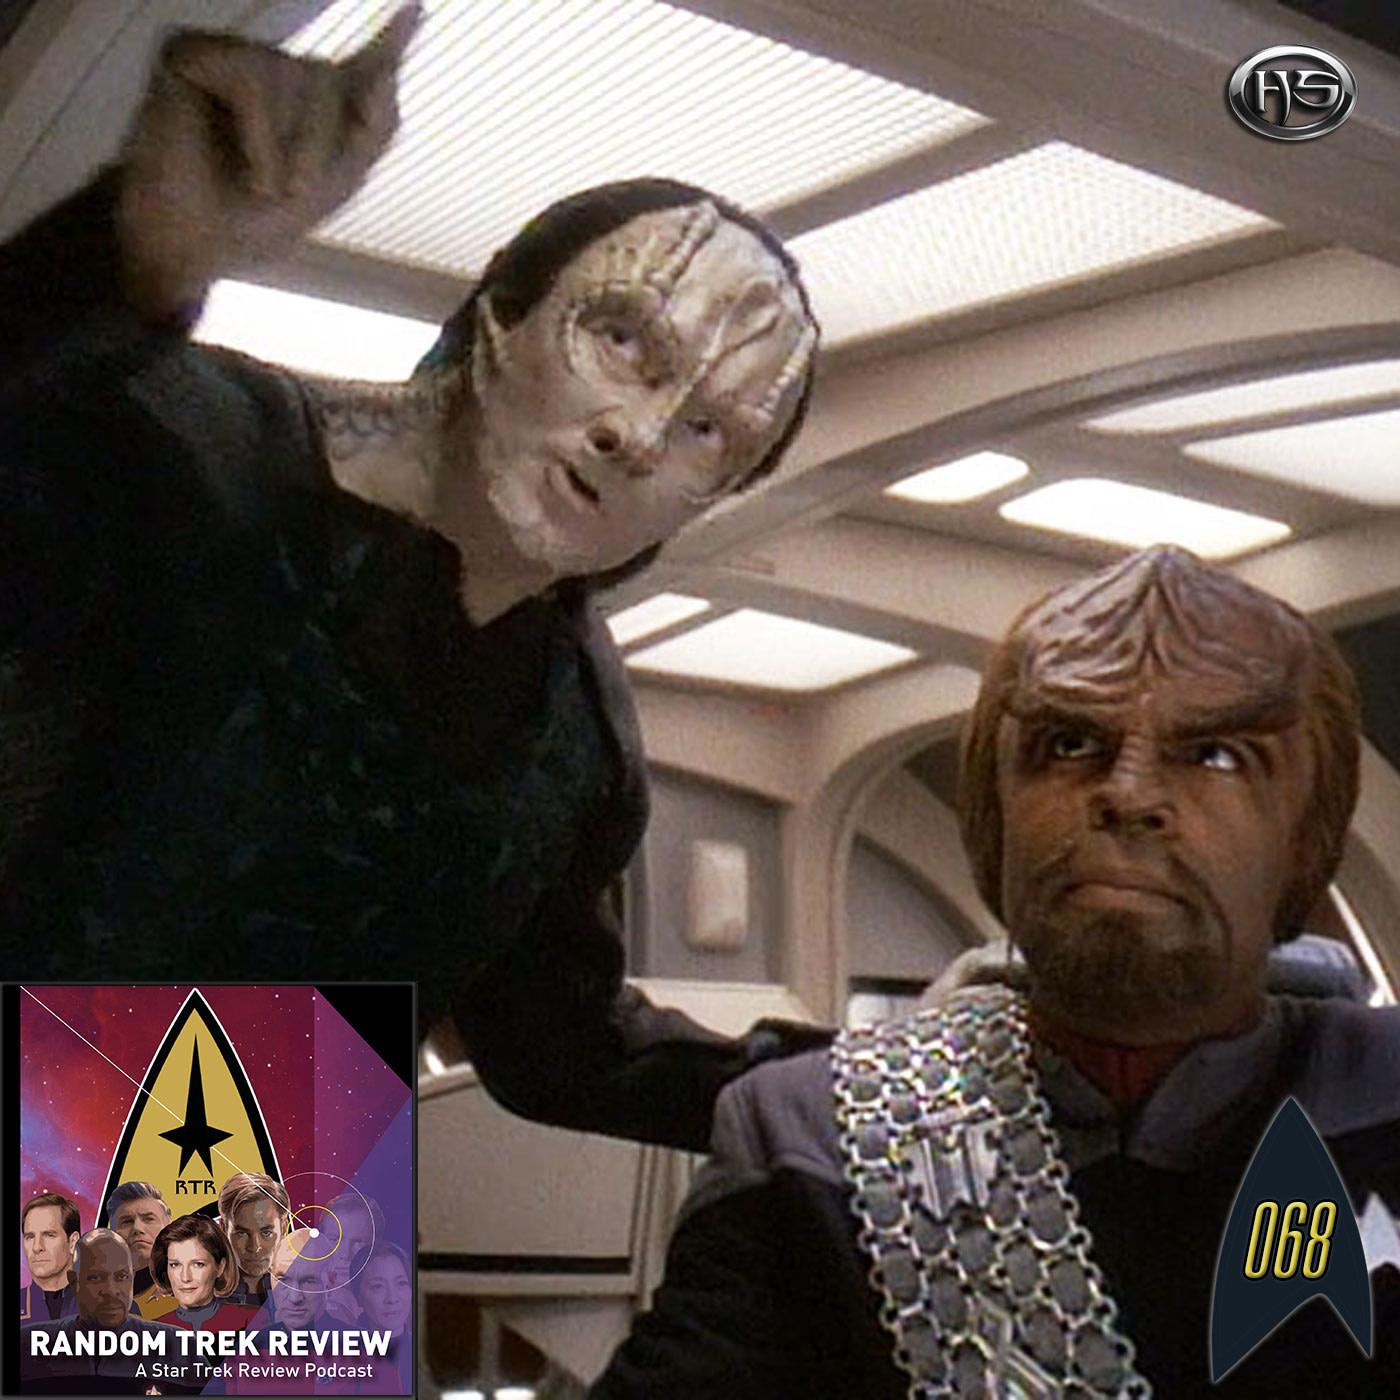 Random Trek Review Episode 68